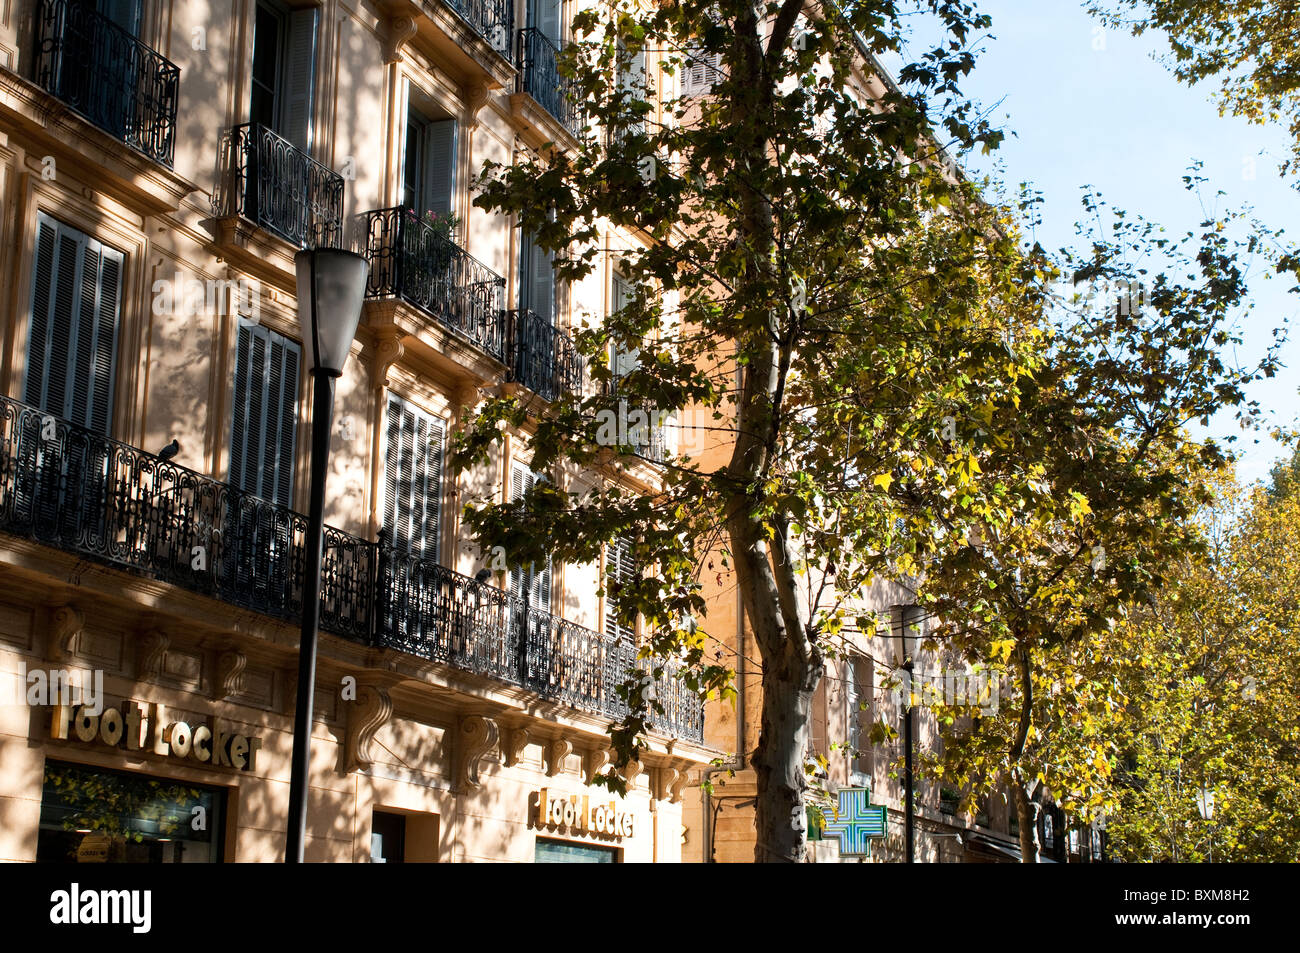 Posh houses on Cours Mirabeau, Aix En Provence, France - Stock Image